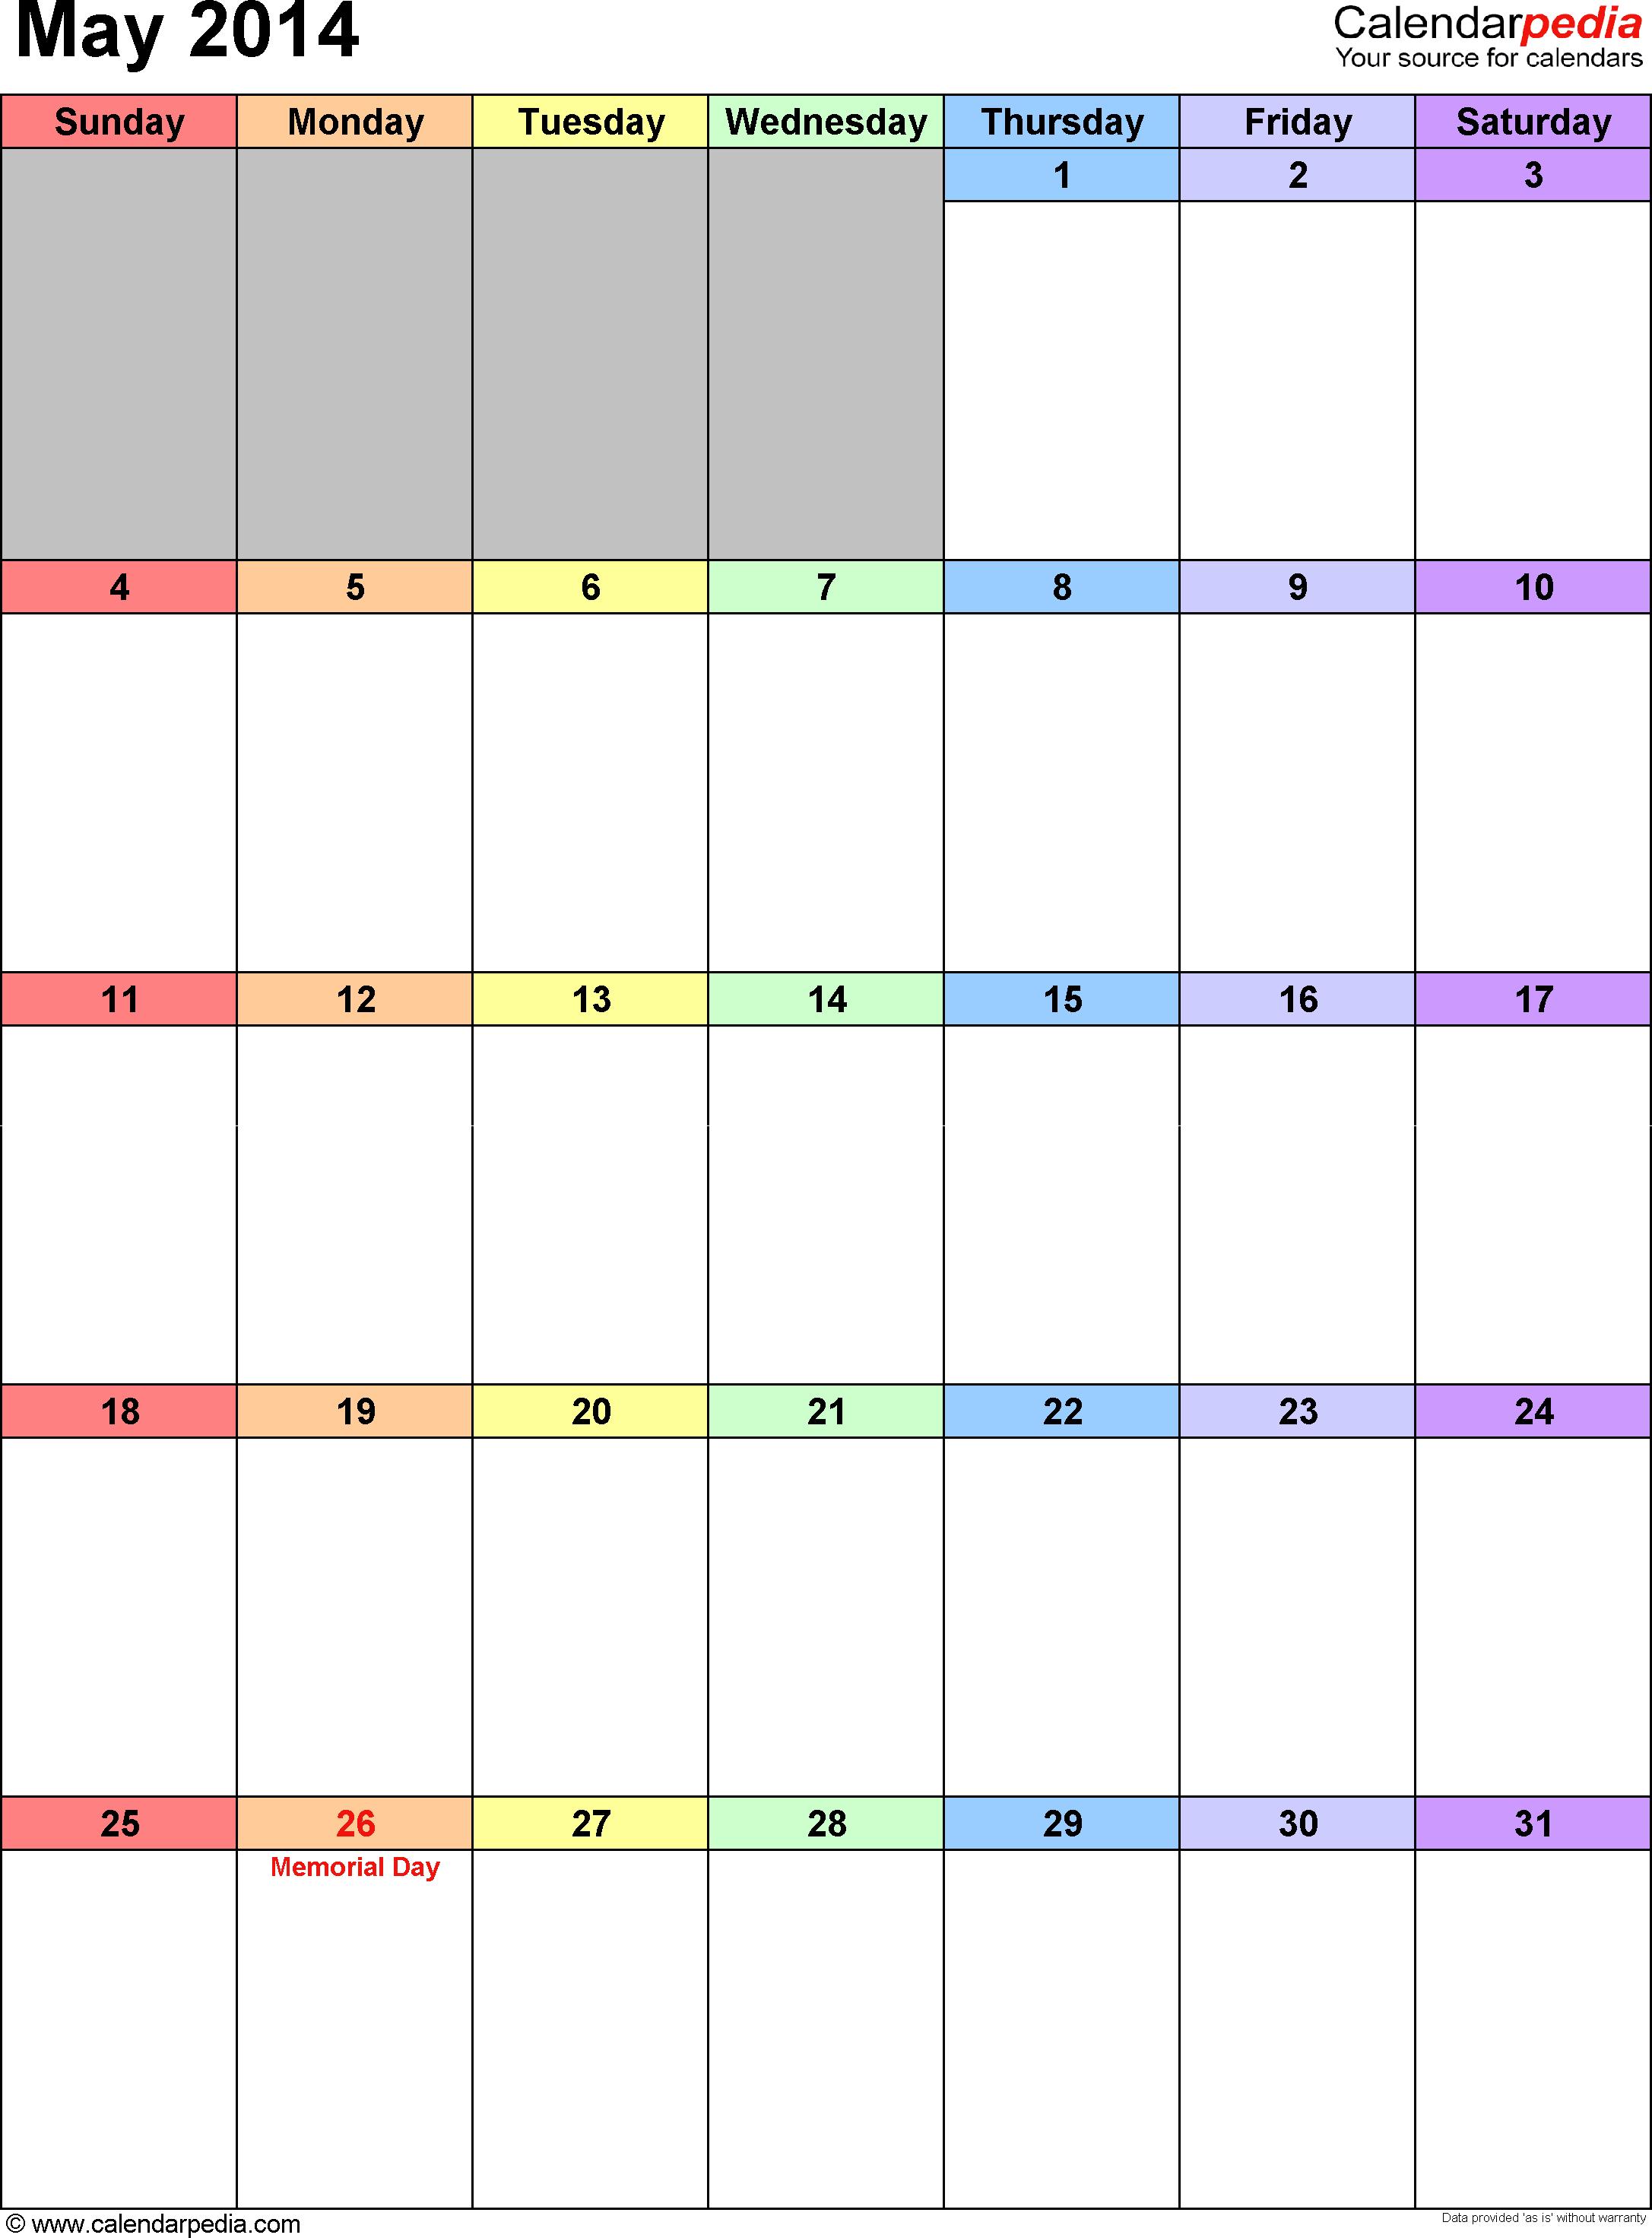 May 2014 calendar as printable Word, Excel & PDF templates